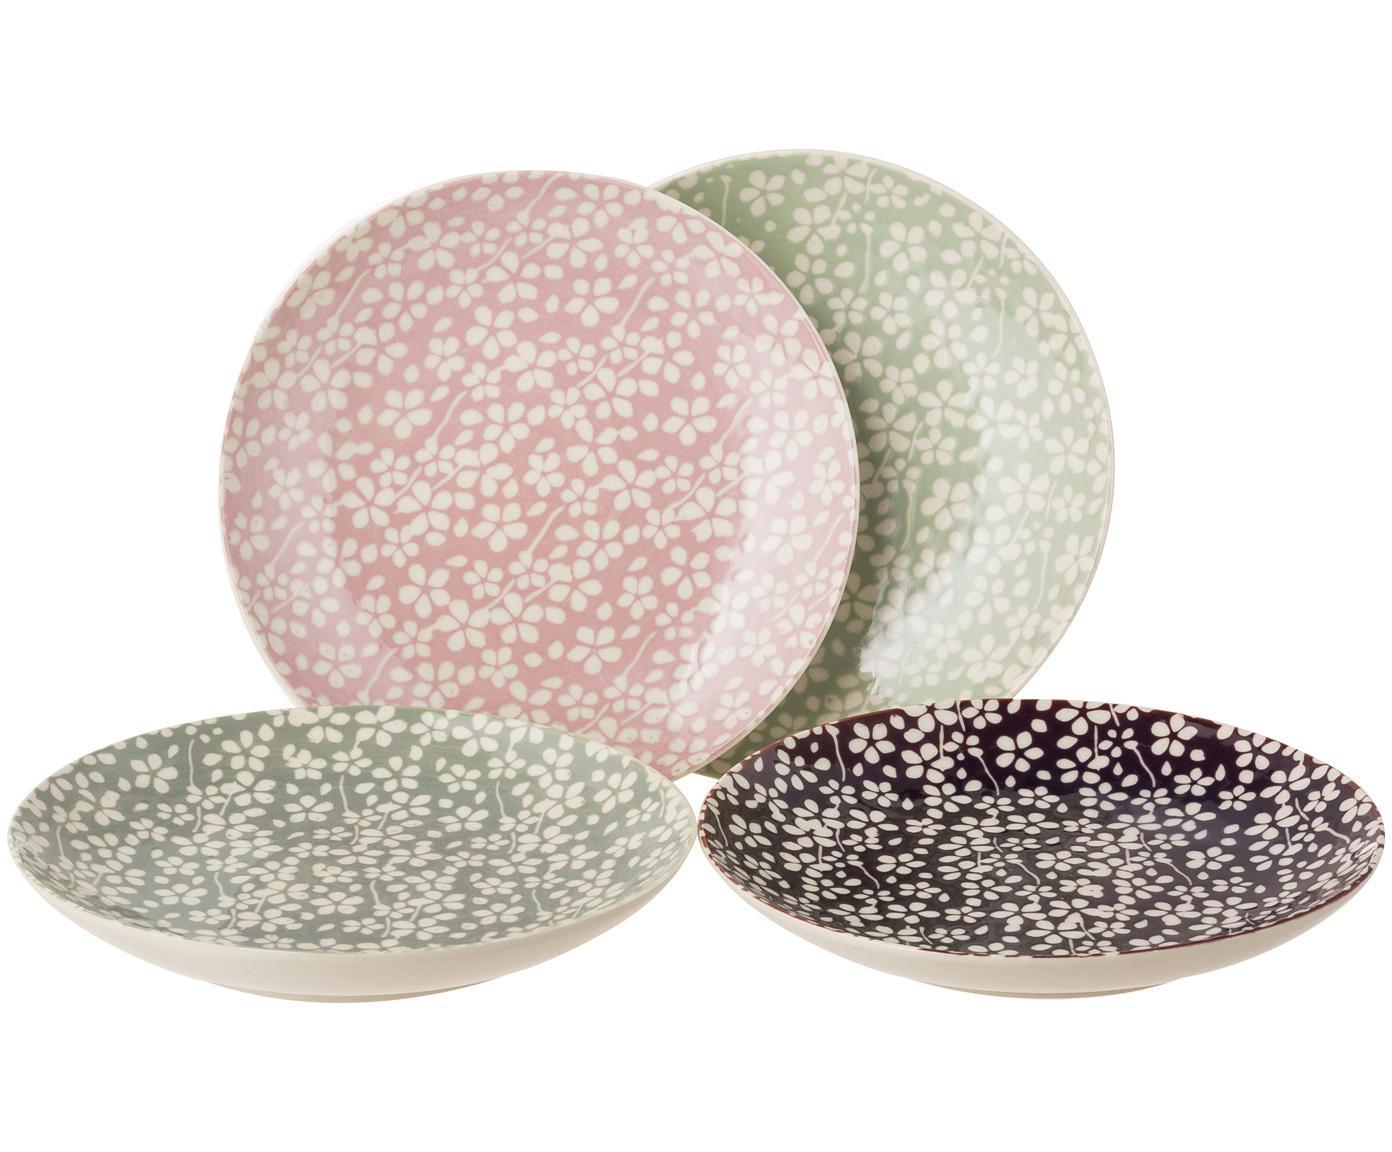 Dessertteller Seeke mit kleinem Muster, 4er-Set, Steingut, Lorbeer, Rauchblau, Pflaume, Mauve, Creme, Ø 15 cm